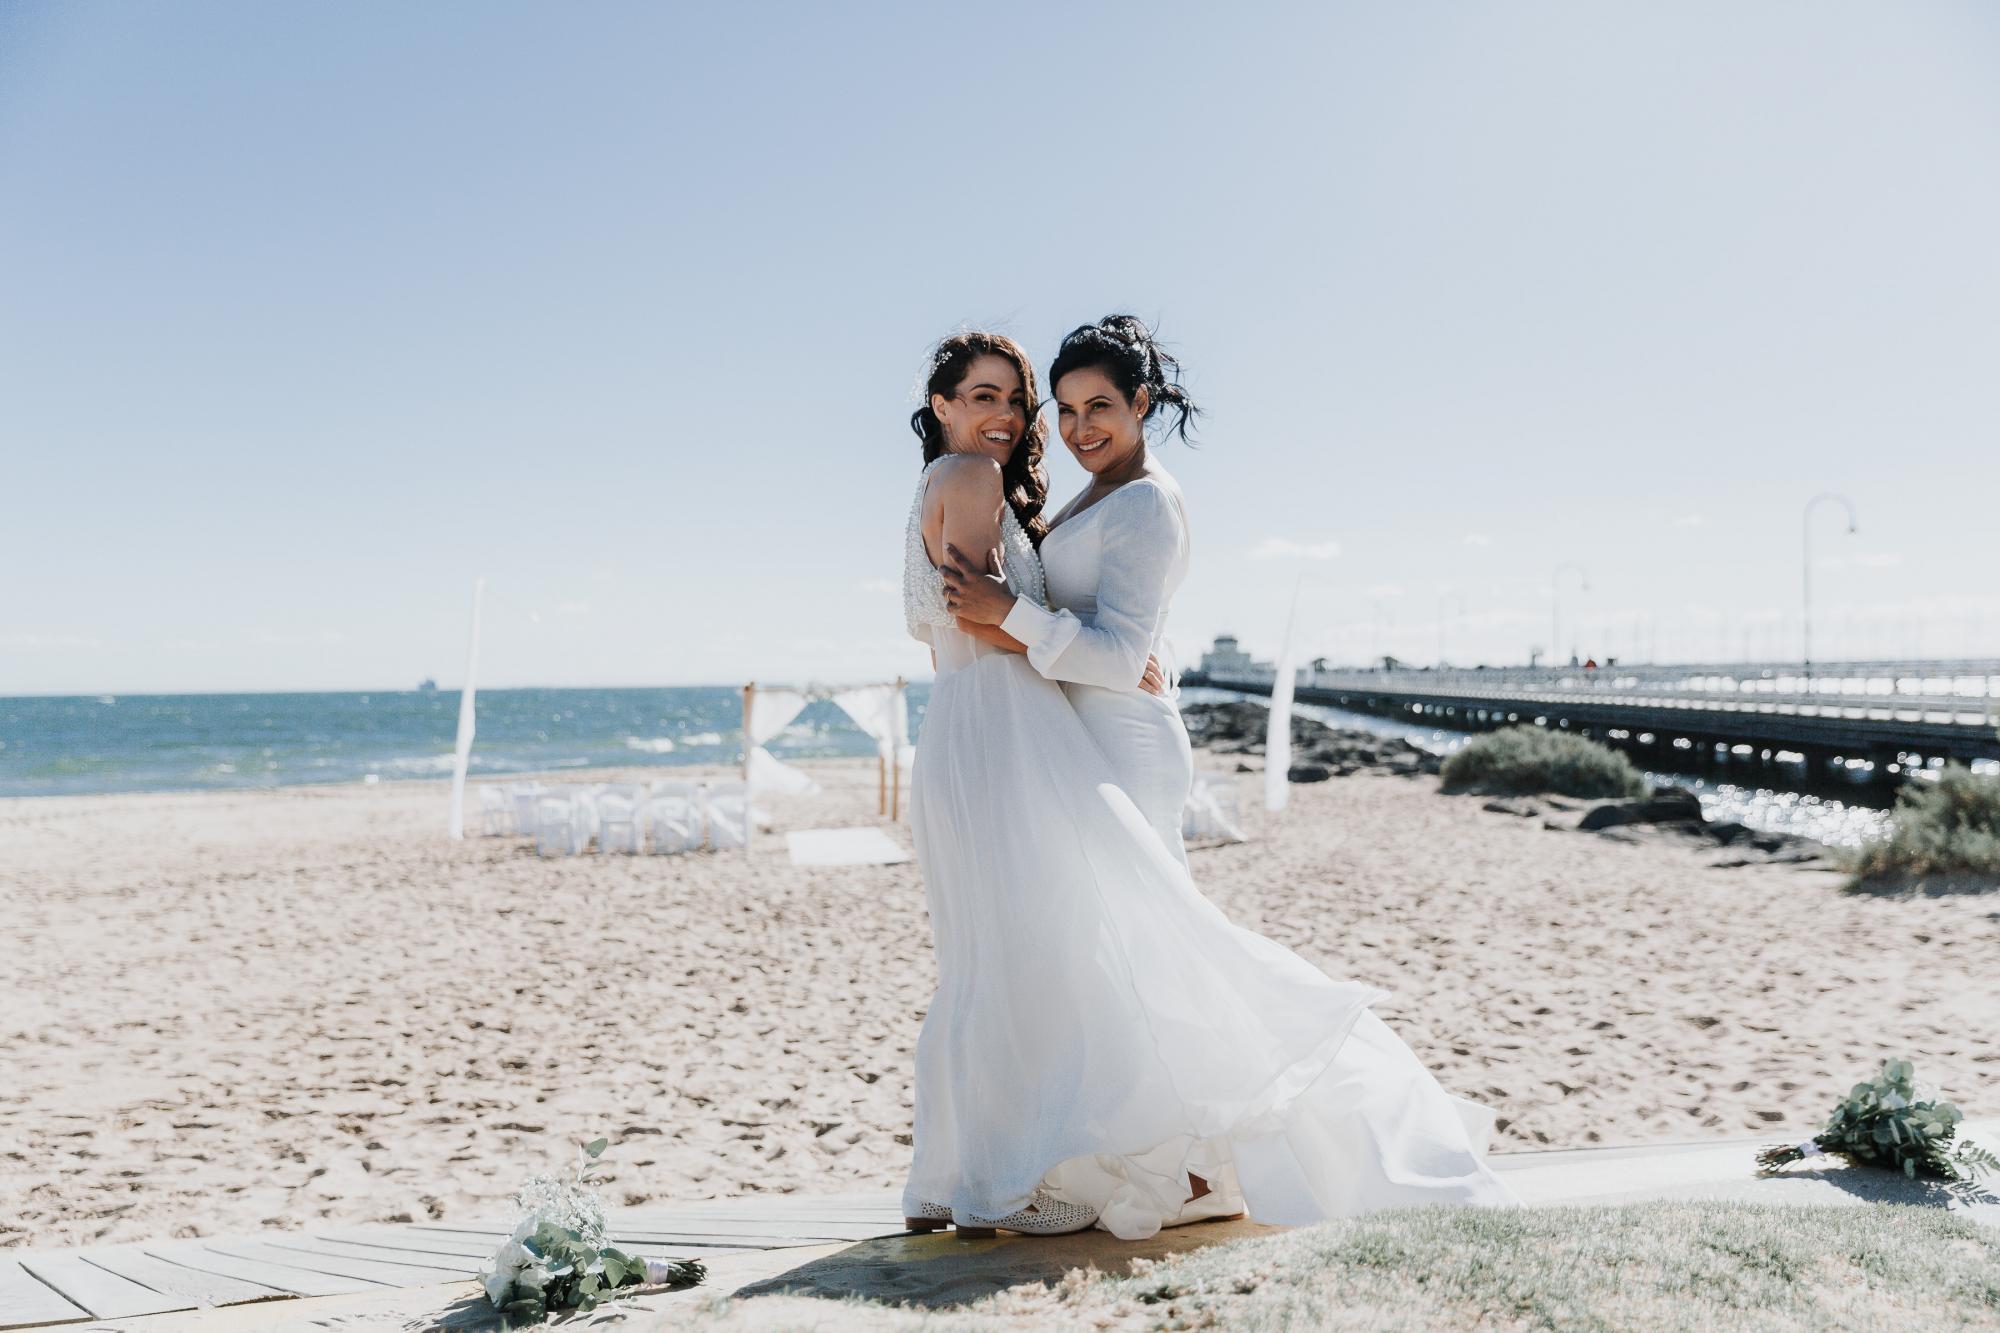 St Kilda Weddings with Melbourne Celebrant Meriki Comito